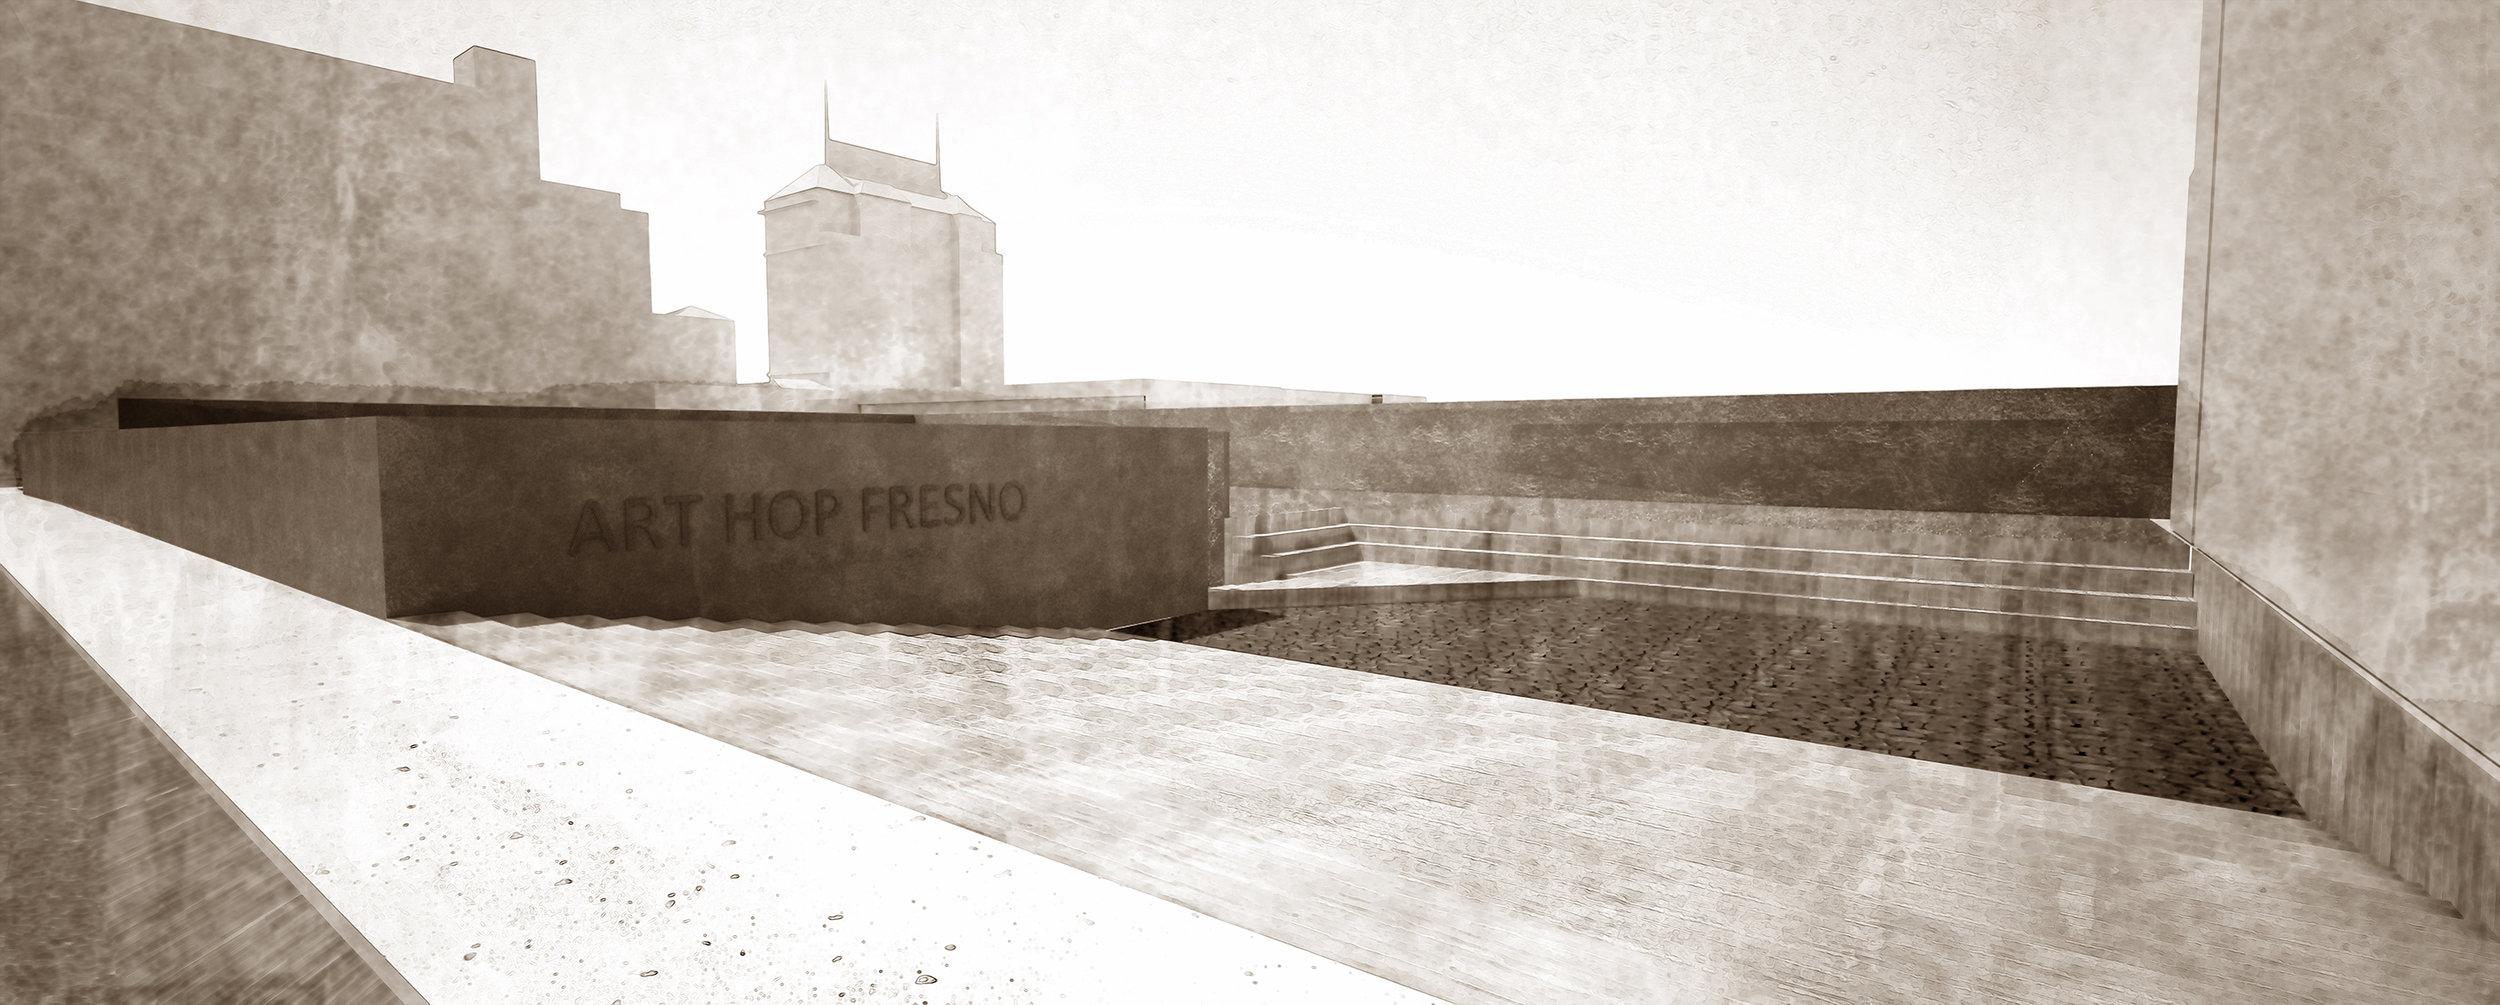 3. Instalation Space at Fresno Met's Yard